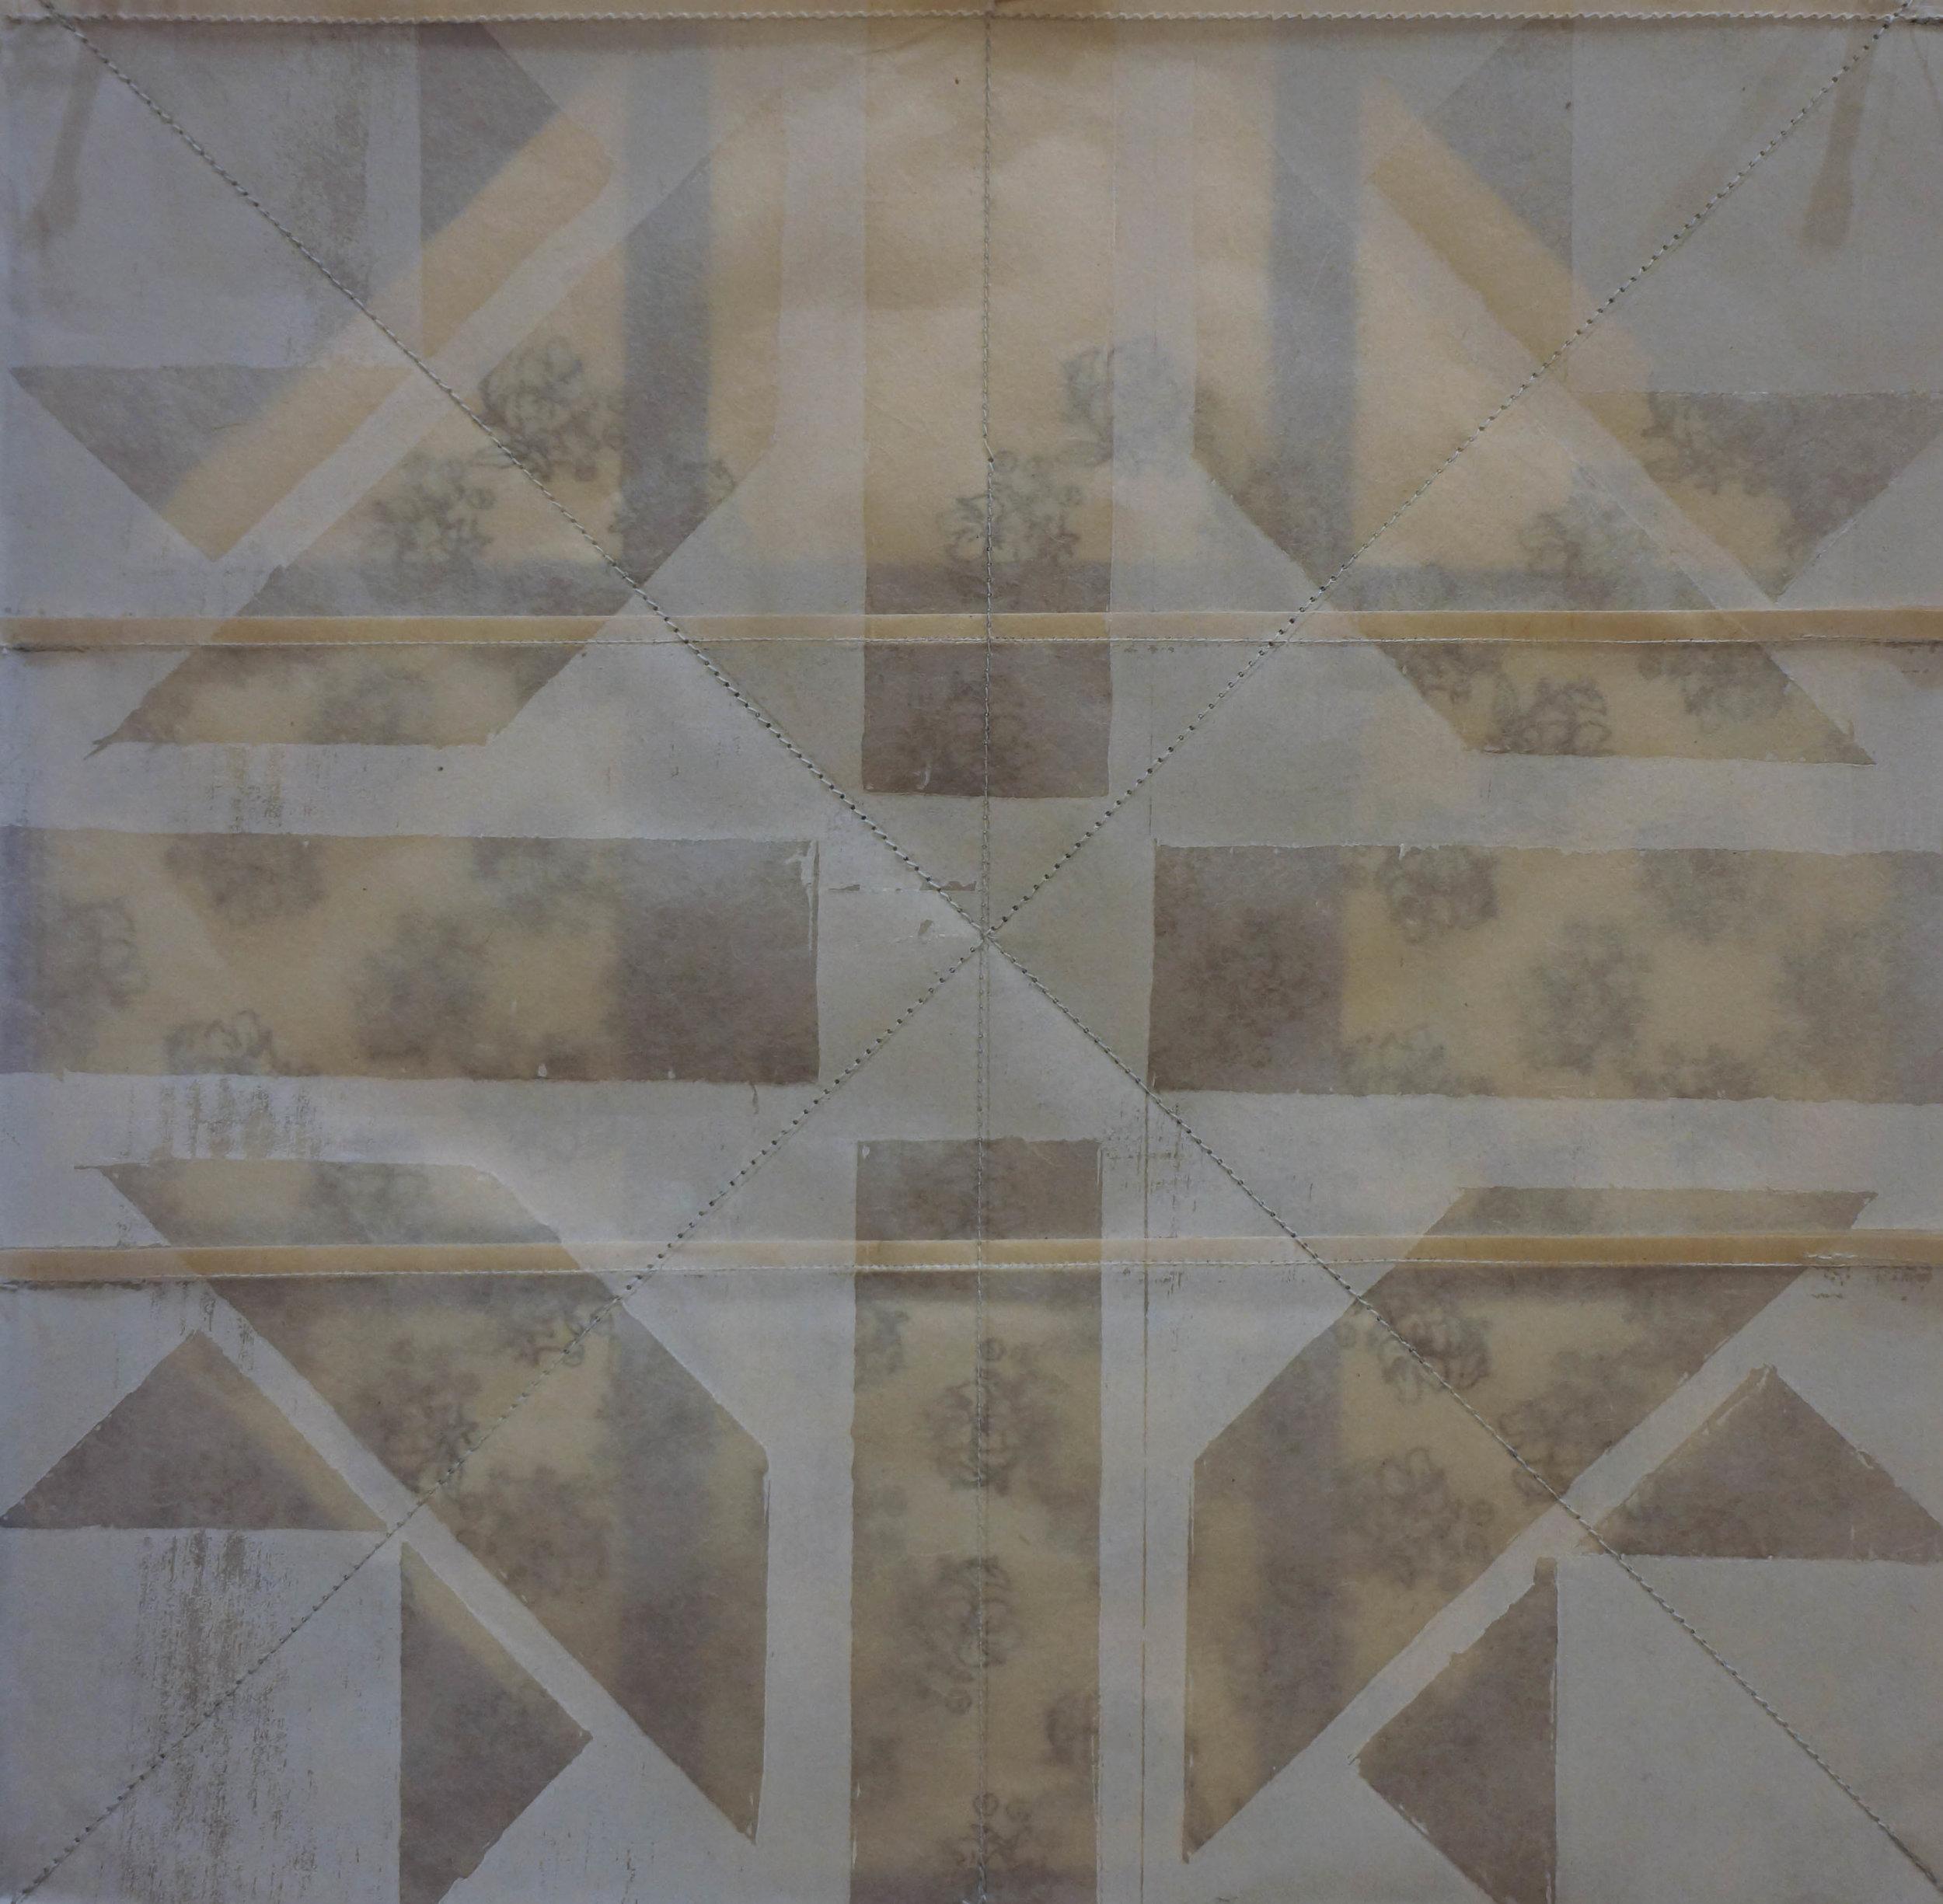 "Catharanthus Roseus & Misoprostol, Relief, cyanotype, and paper piecing, 12"" x 12"", 2017."